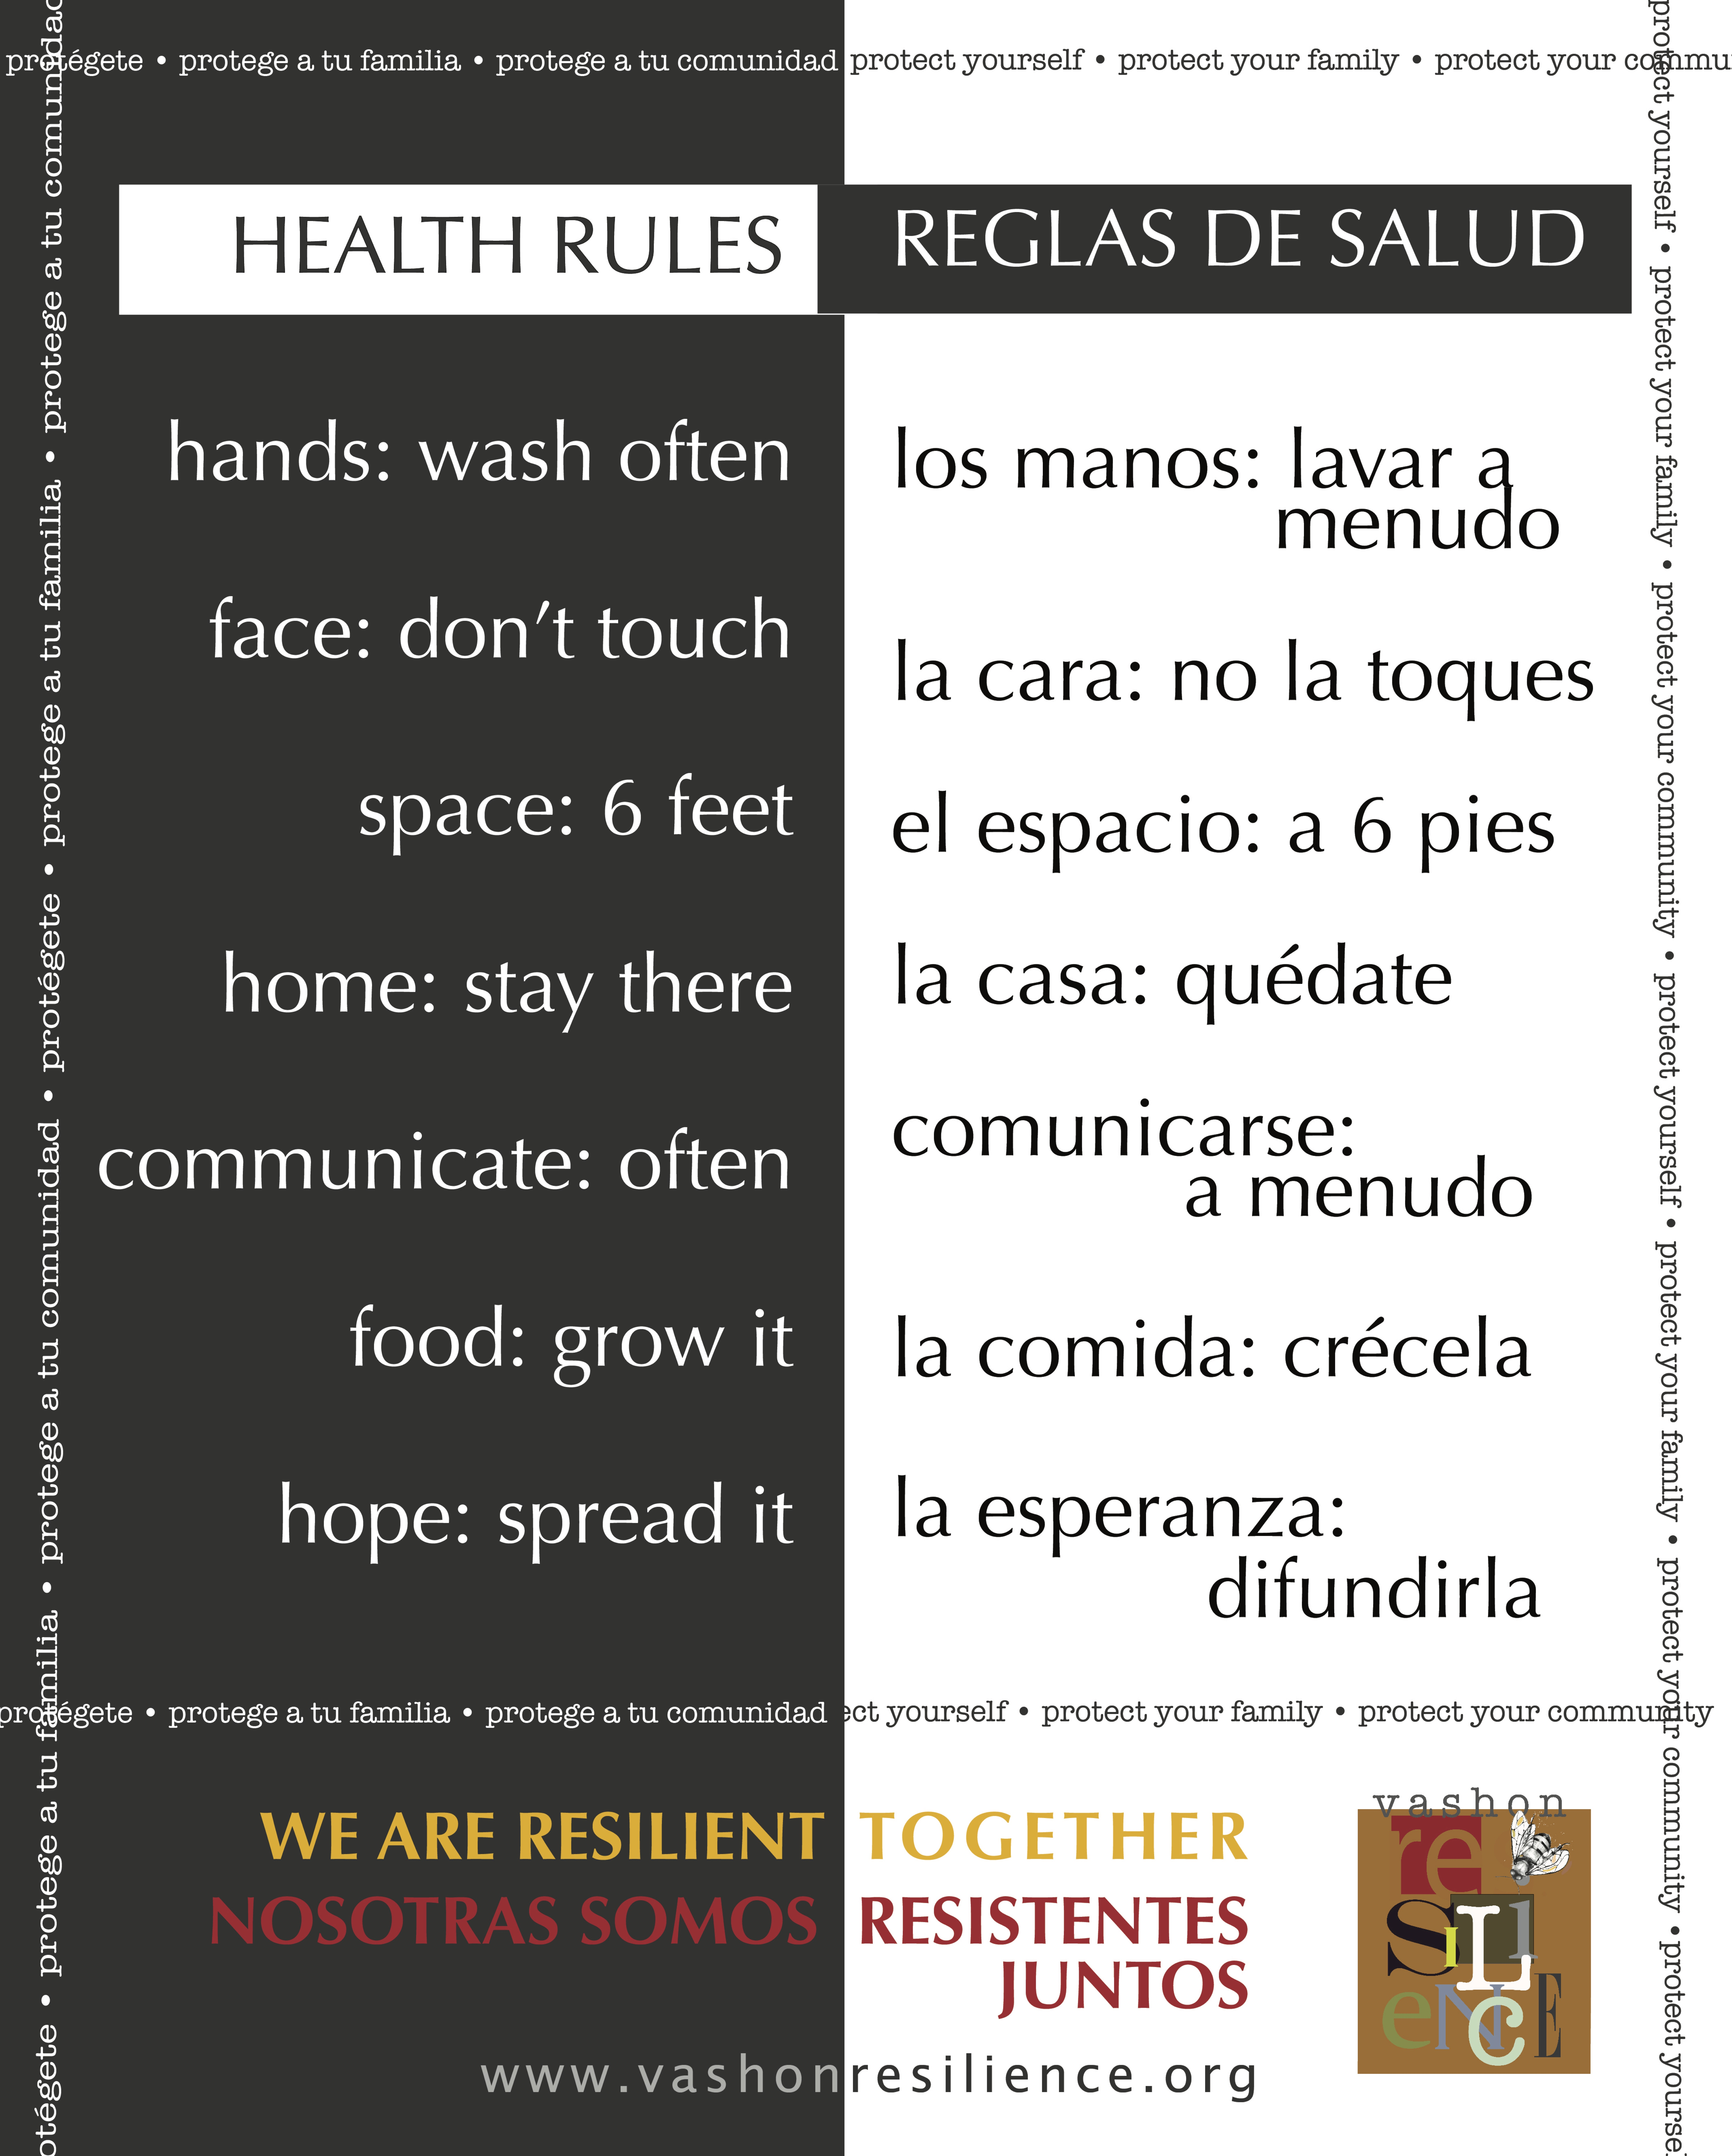 HealthRules.jpg